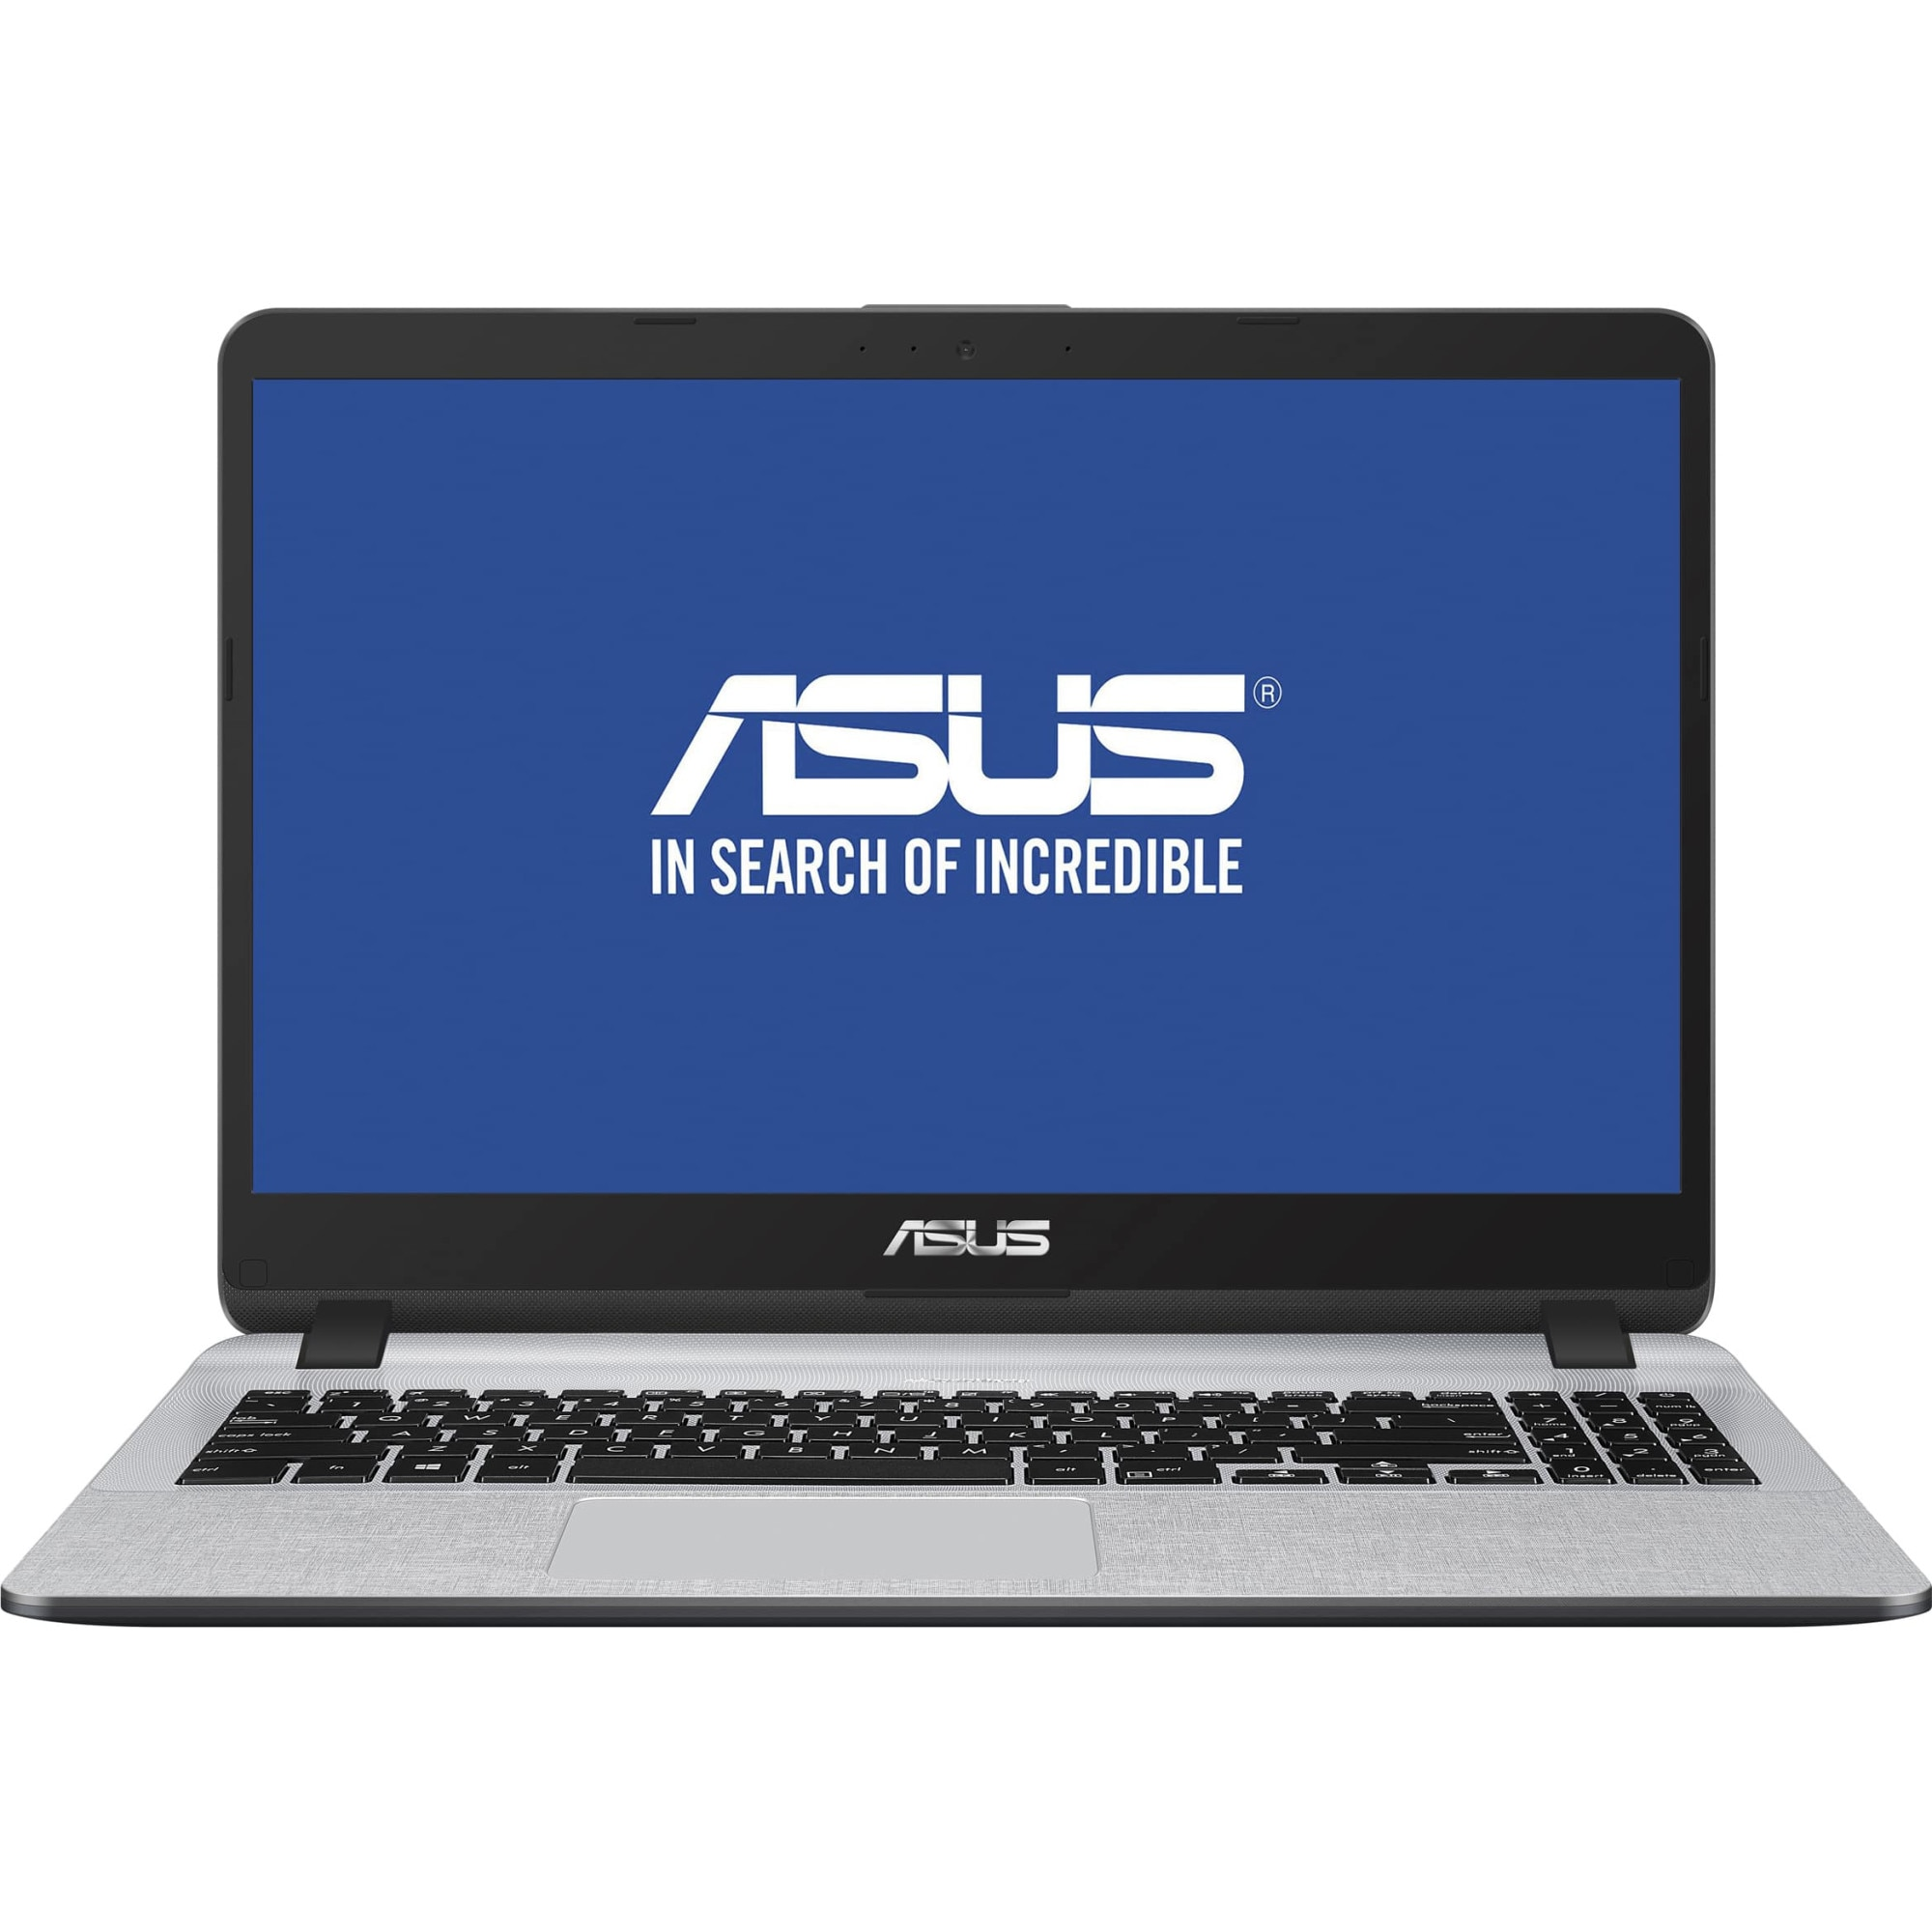 "Fotografie Laptop ASUS X507UA cu procesor Intel® Core™ i5-8250U pana la 3.40 GHz, Kaby Lake R, 15.6"", Full HD, 8GB, 1TB, Intel UHD Graphics 620, Endless OS, Star Grey"